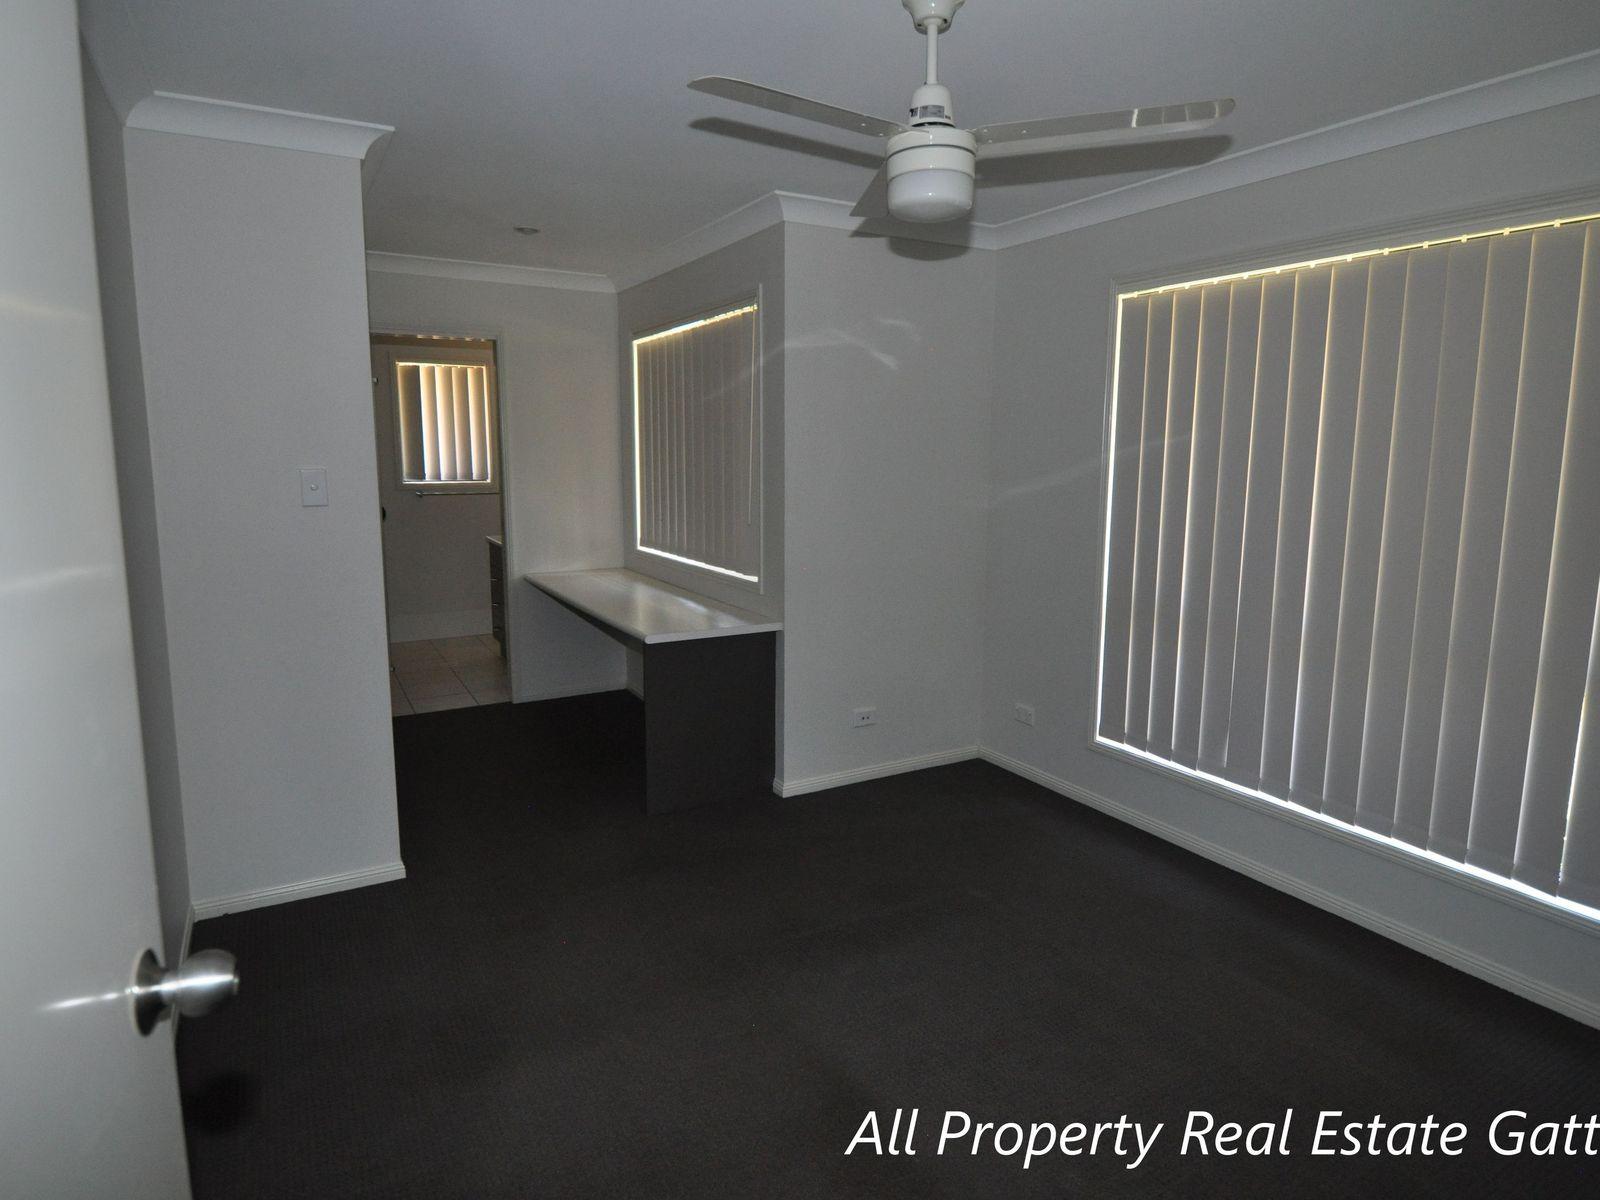 Room 3 / 8 Boysen Court, Adare